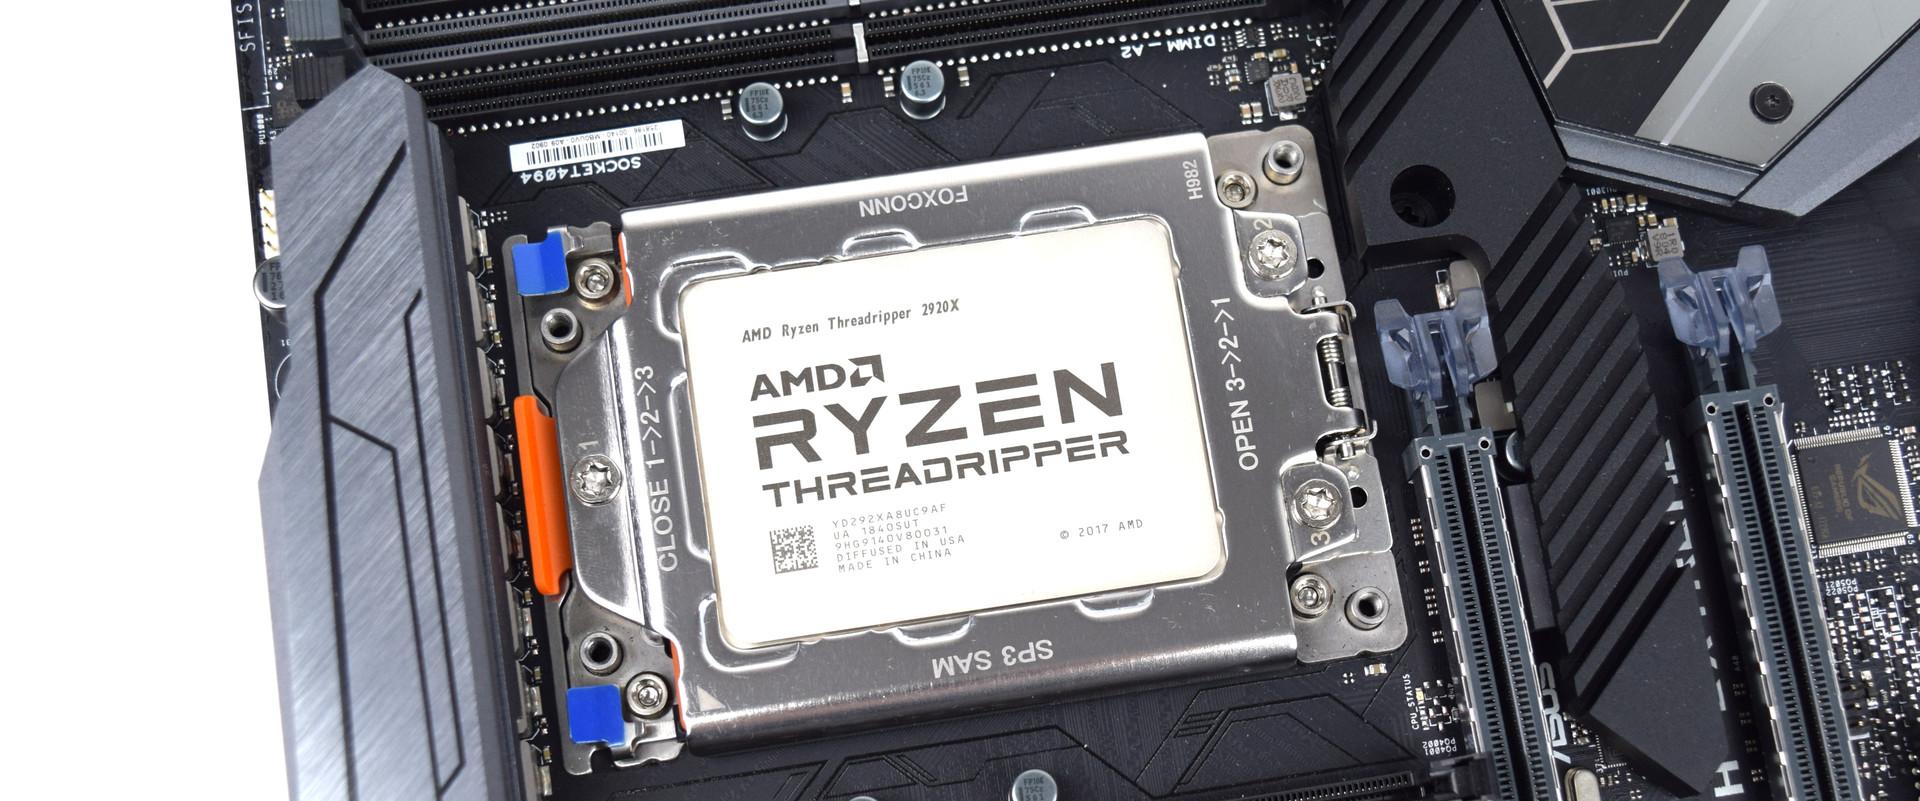 Review AMD Ryzen Threadripper 2920X (12 cores, 24 threads